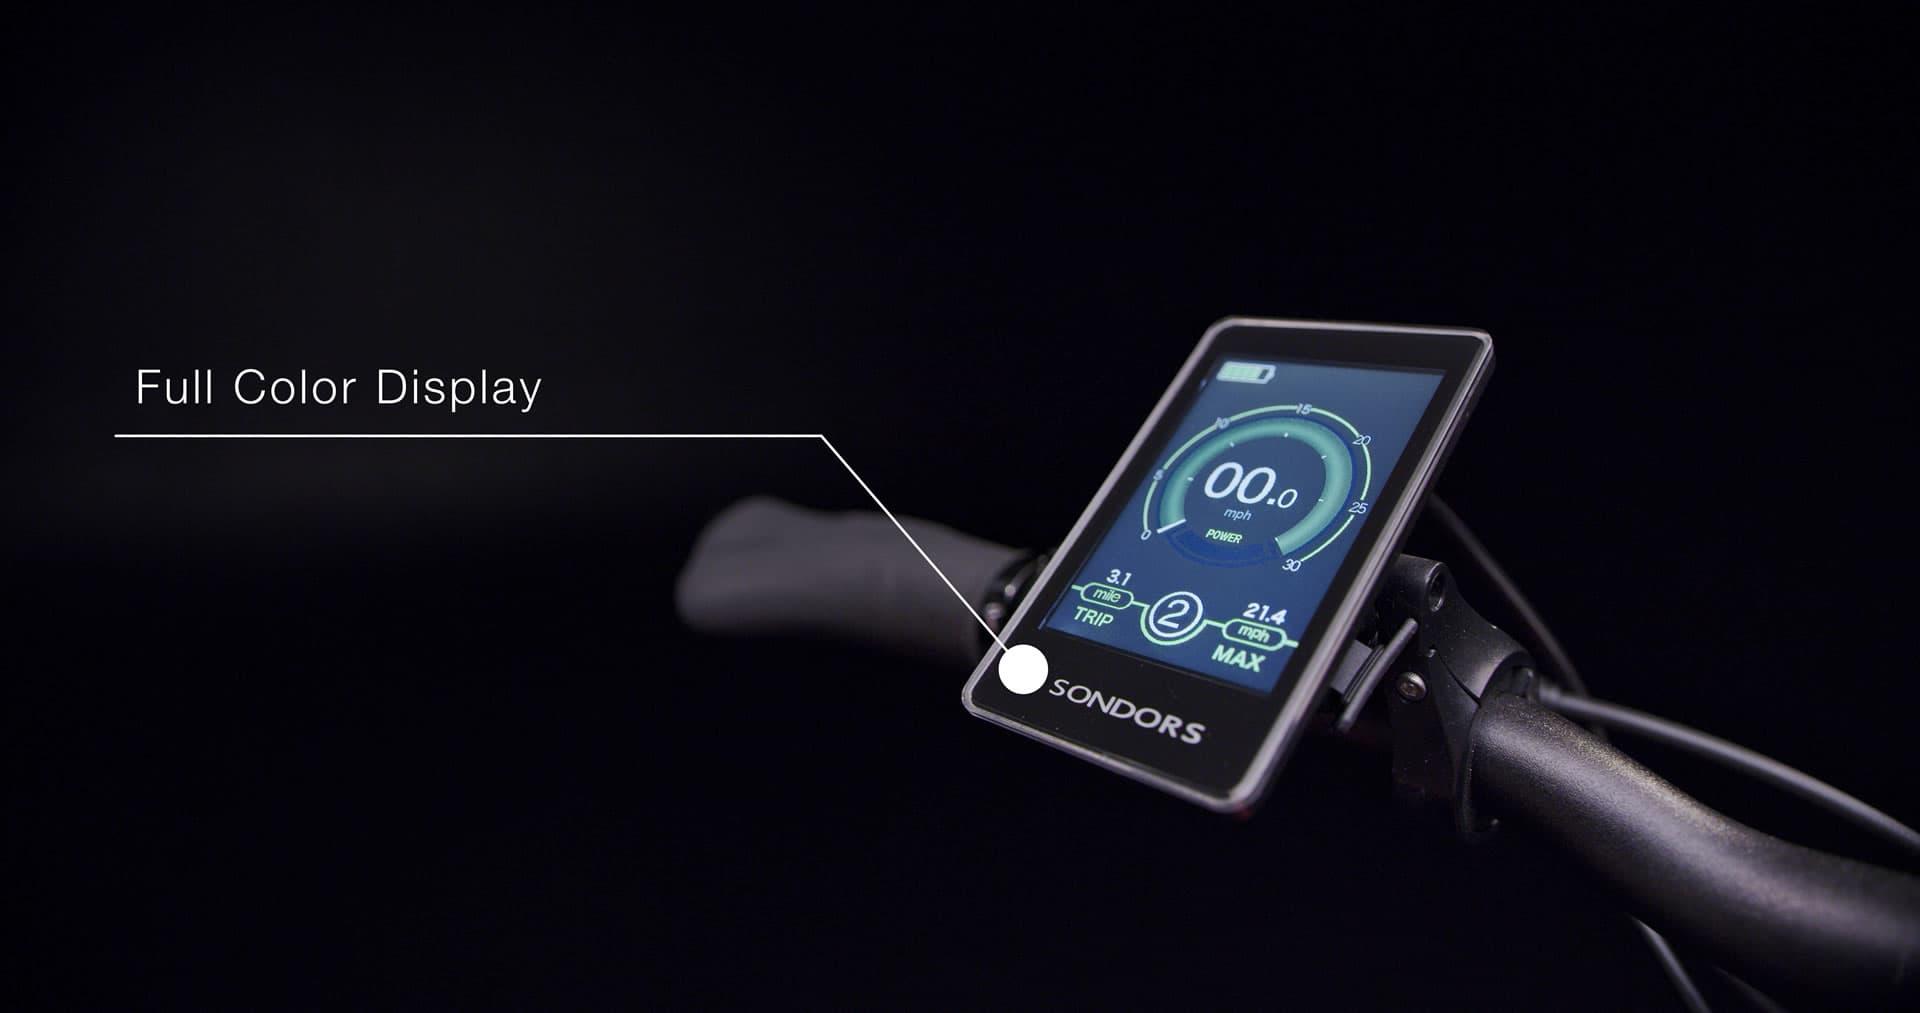 Sondors Fold XS LCD